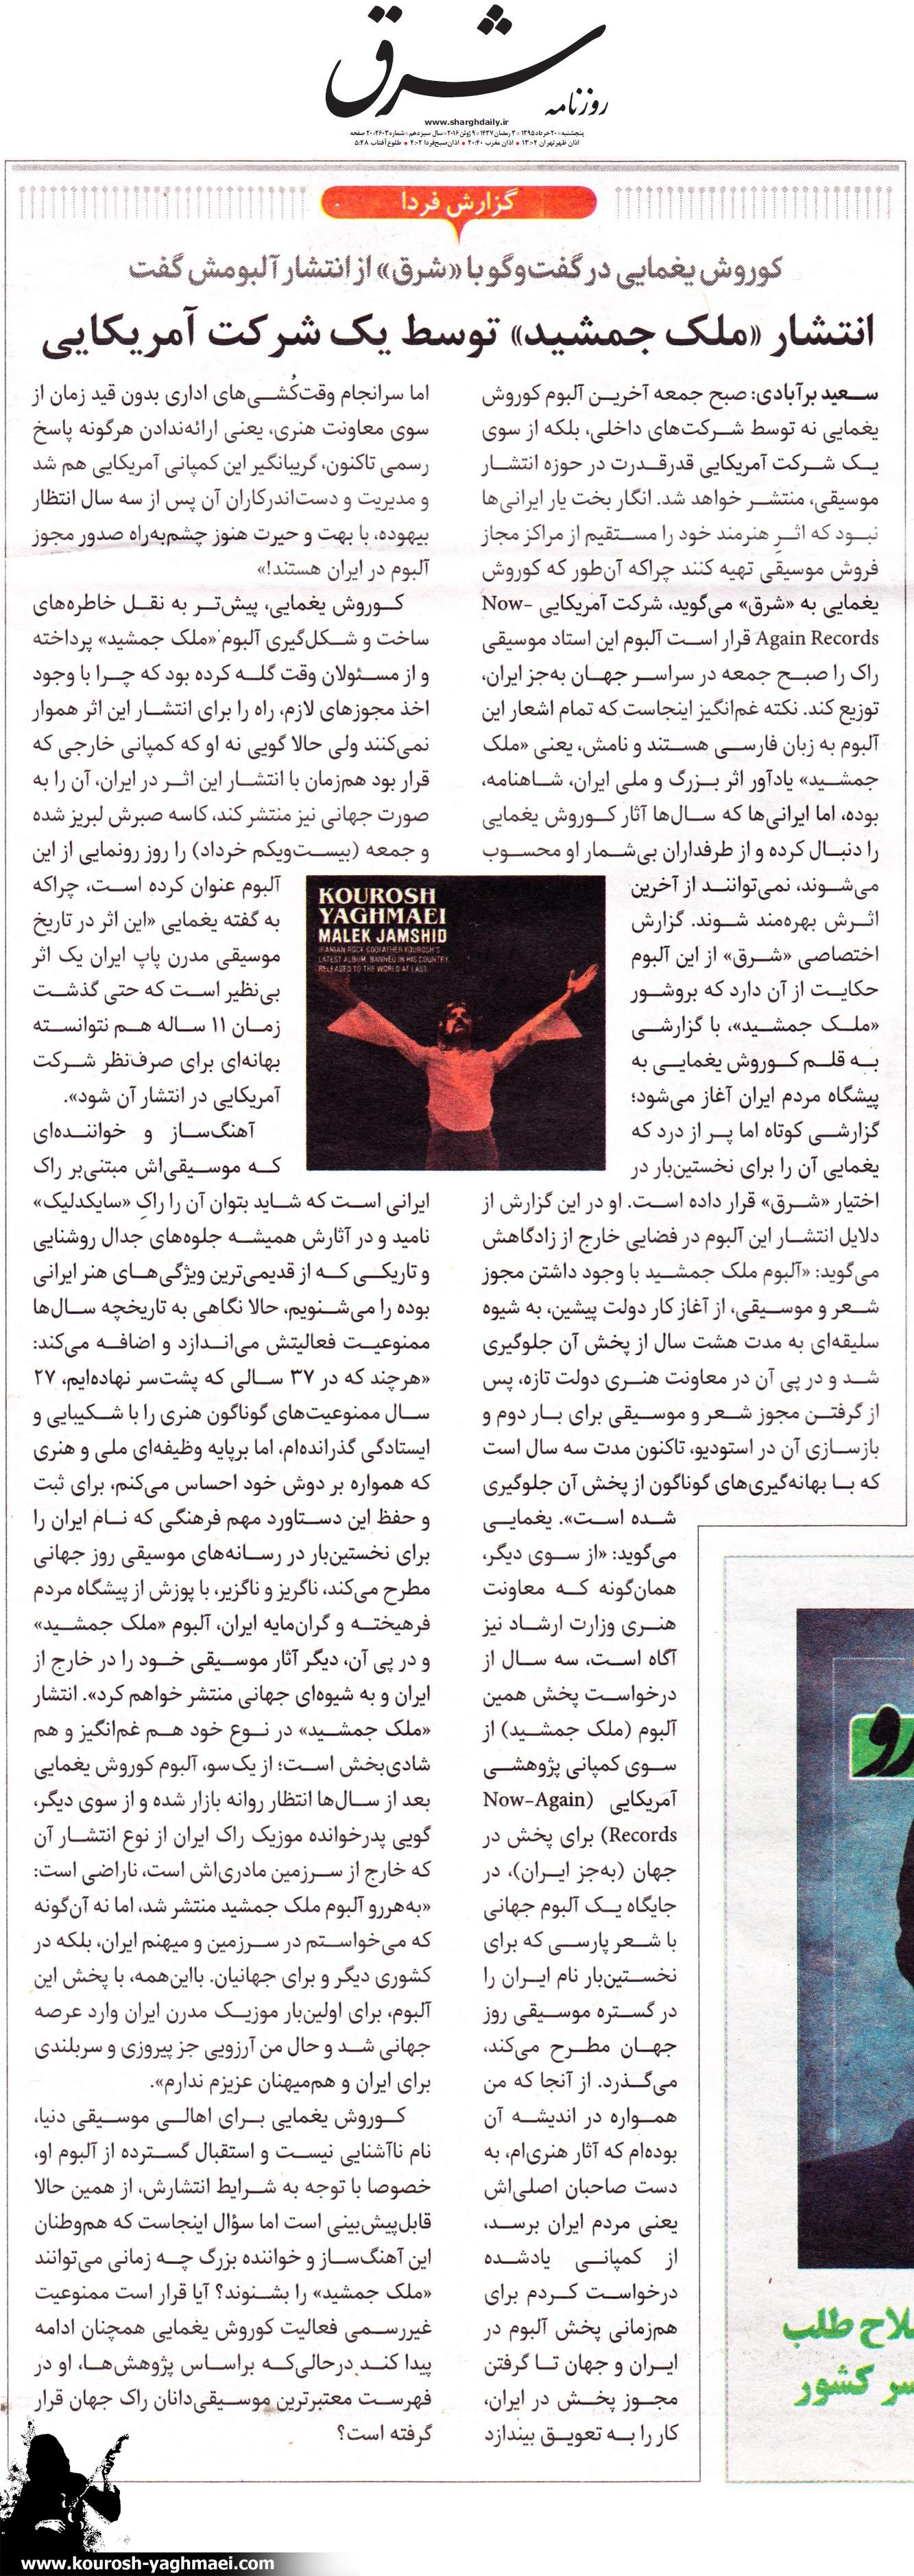 http://kourosh-yaghmaei.com/newspaper/gallery7/Shargh-950320.jpg